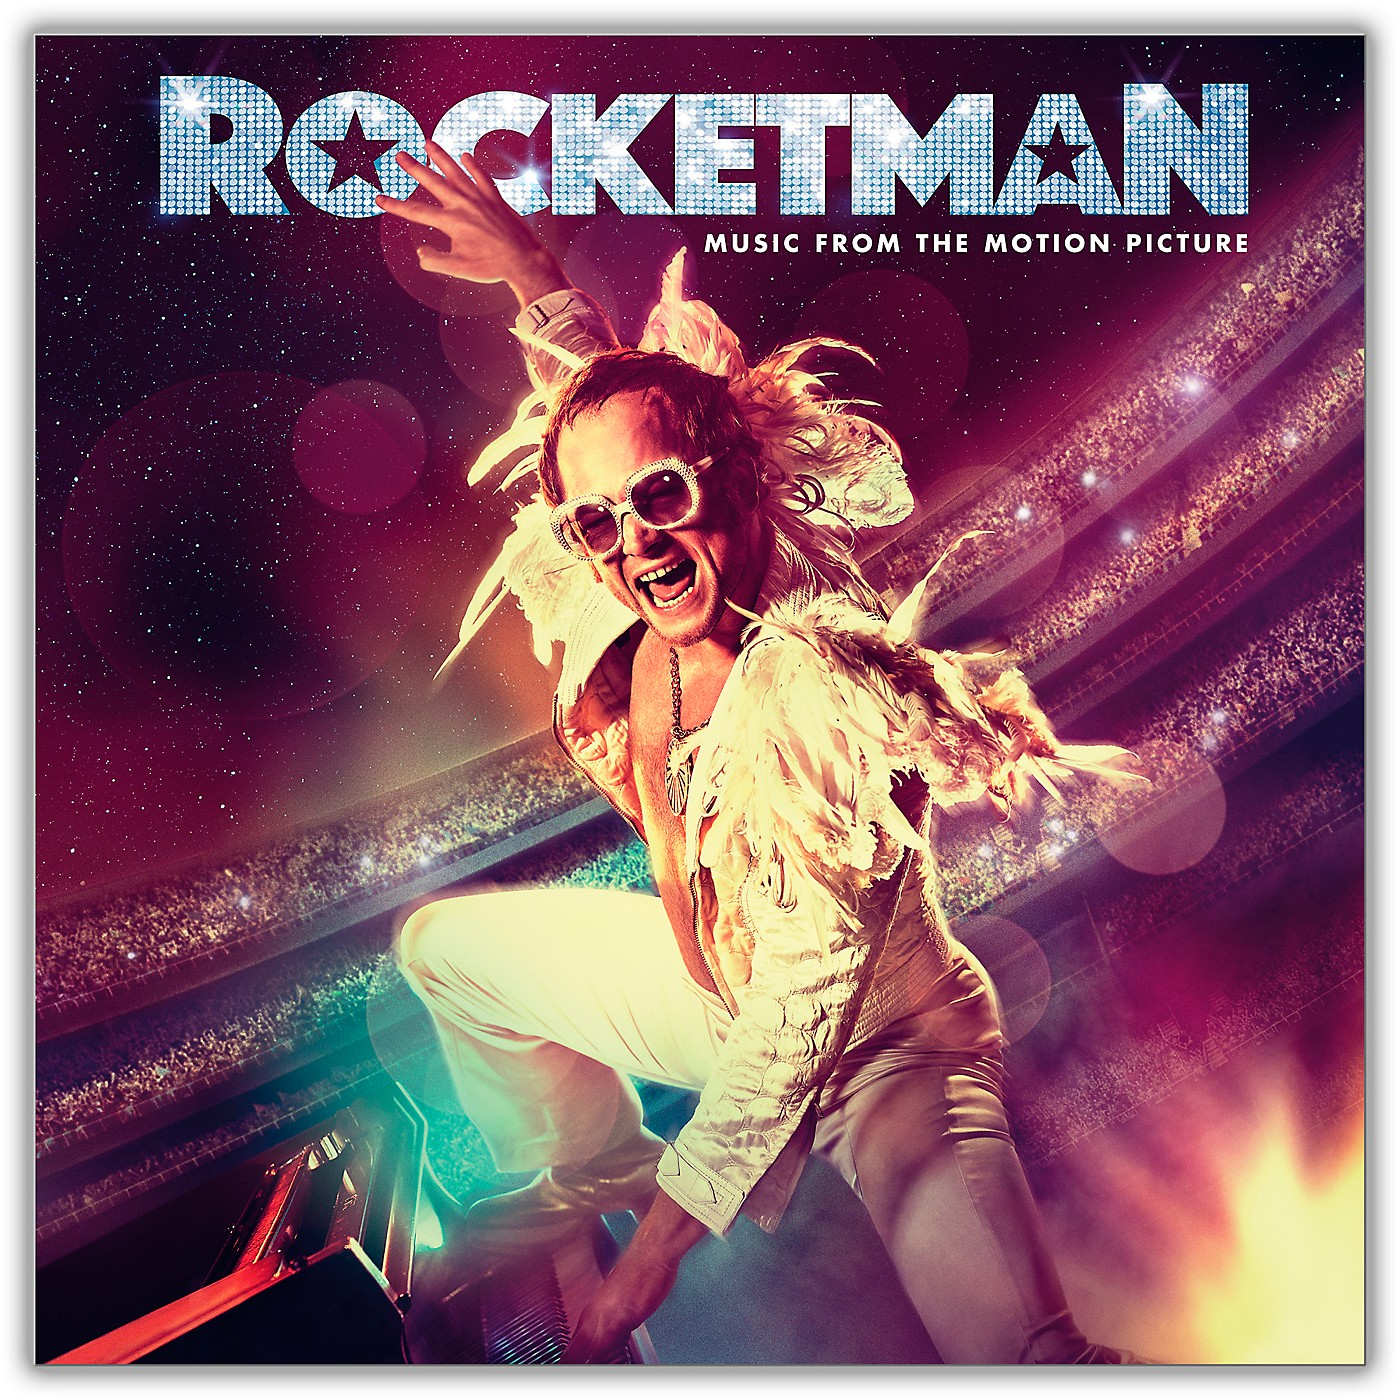 Universal Music Group Elton John and Taron Egerton - Rocketman (Music From The Motion Picture) Vinyl LP thumbnail